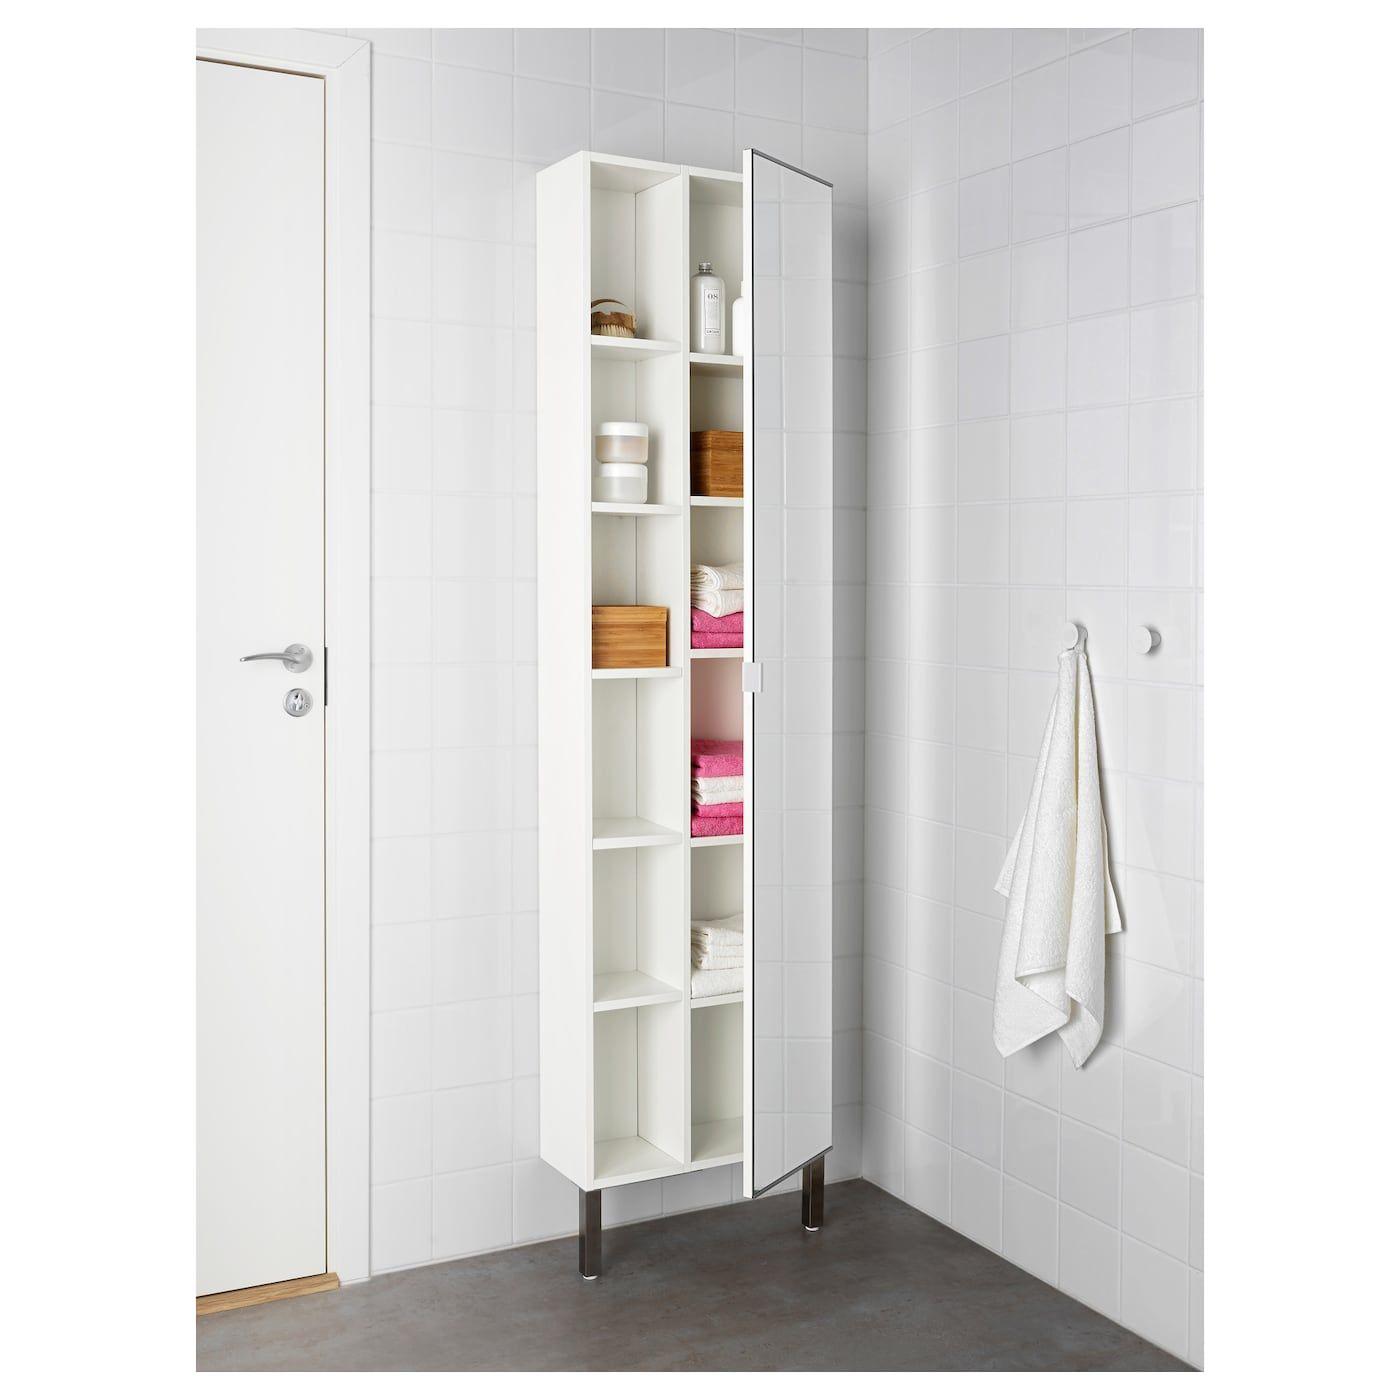 LILLÅNGEN Spiegelschrank 1 Tür/1 Abschlregal weiß IKEA